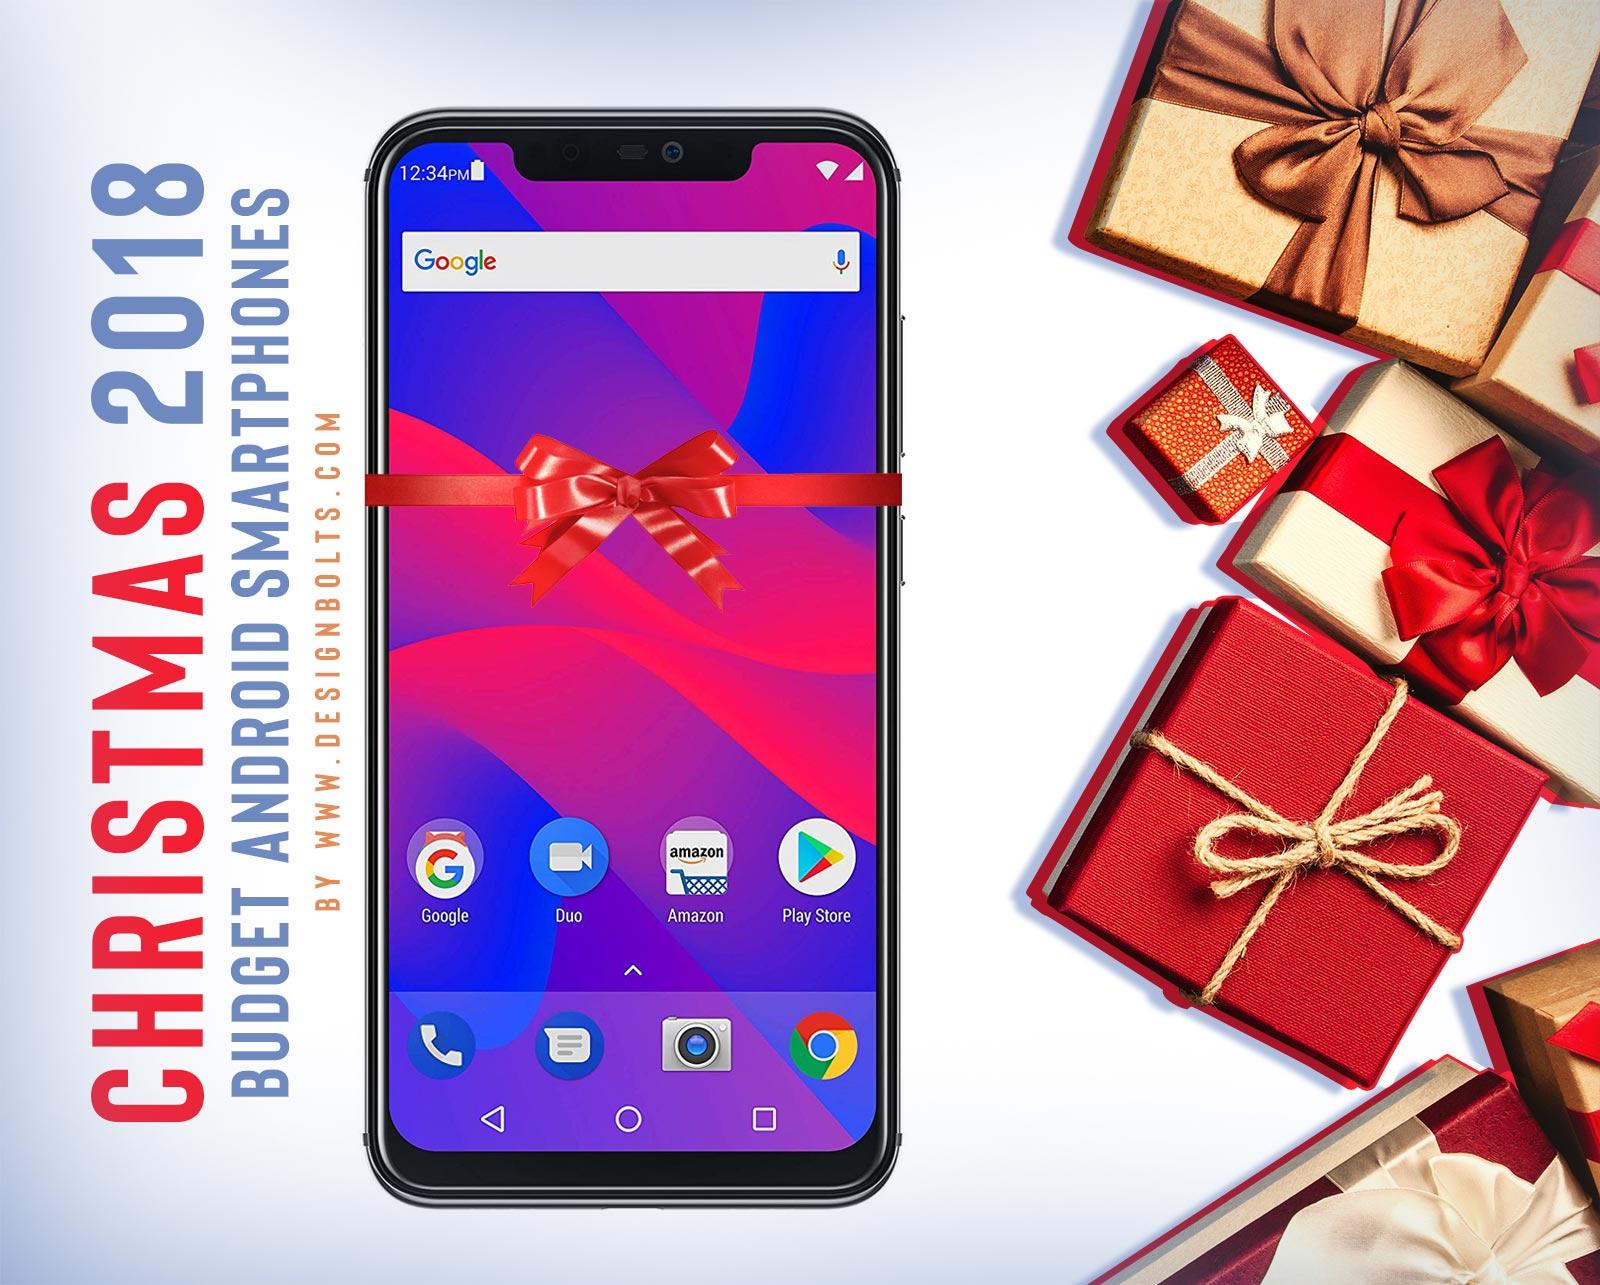 BLU-VIVO-XI+-Android-Smartphone-for-Christmas-Gift-2018